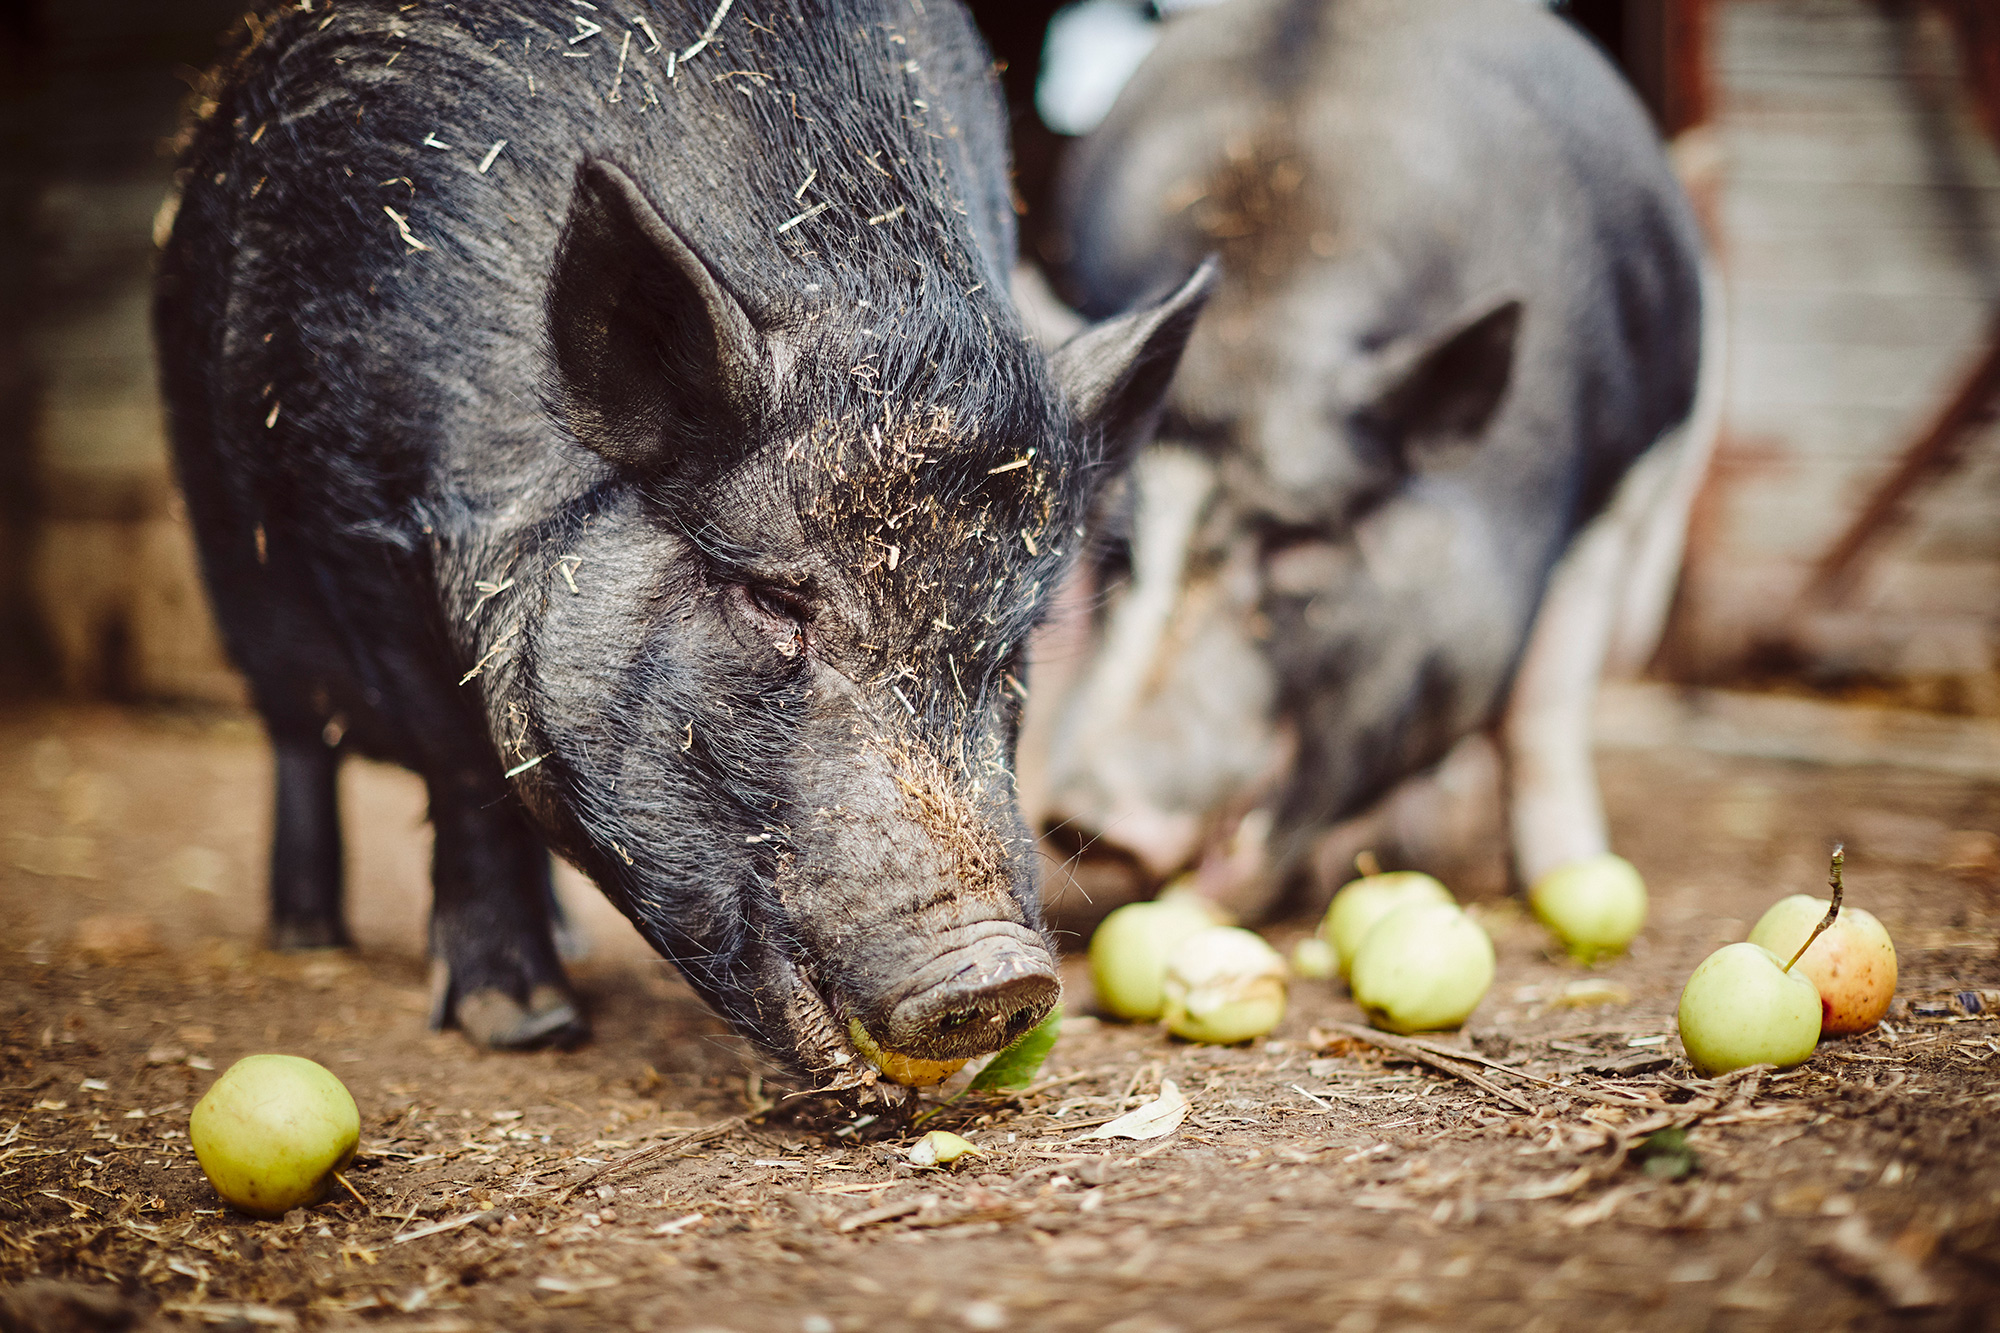 saxbys-pigs-6.jpg